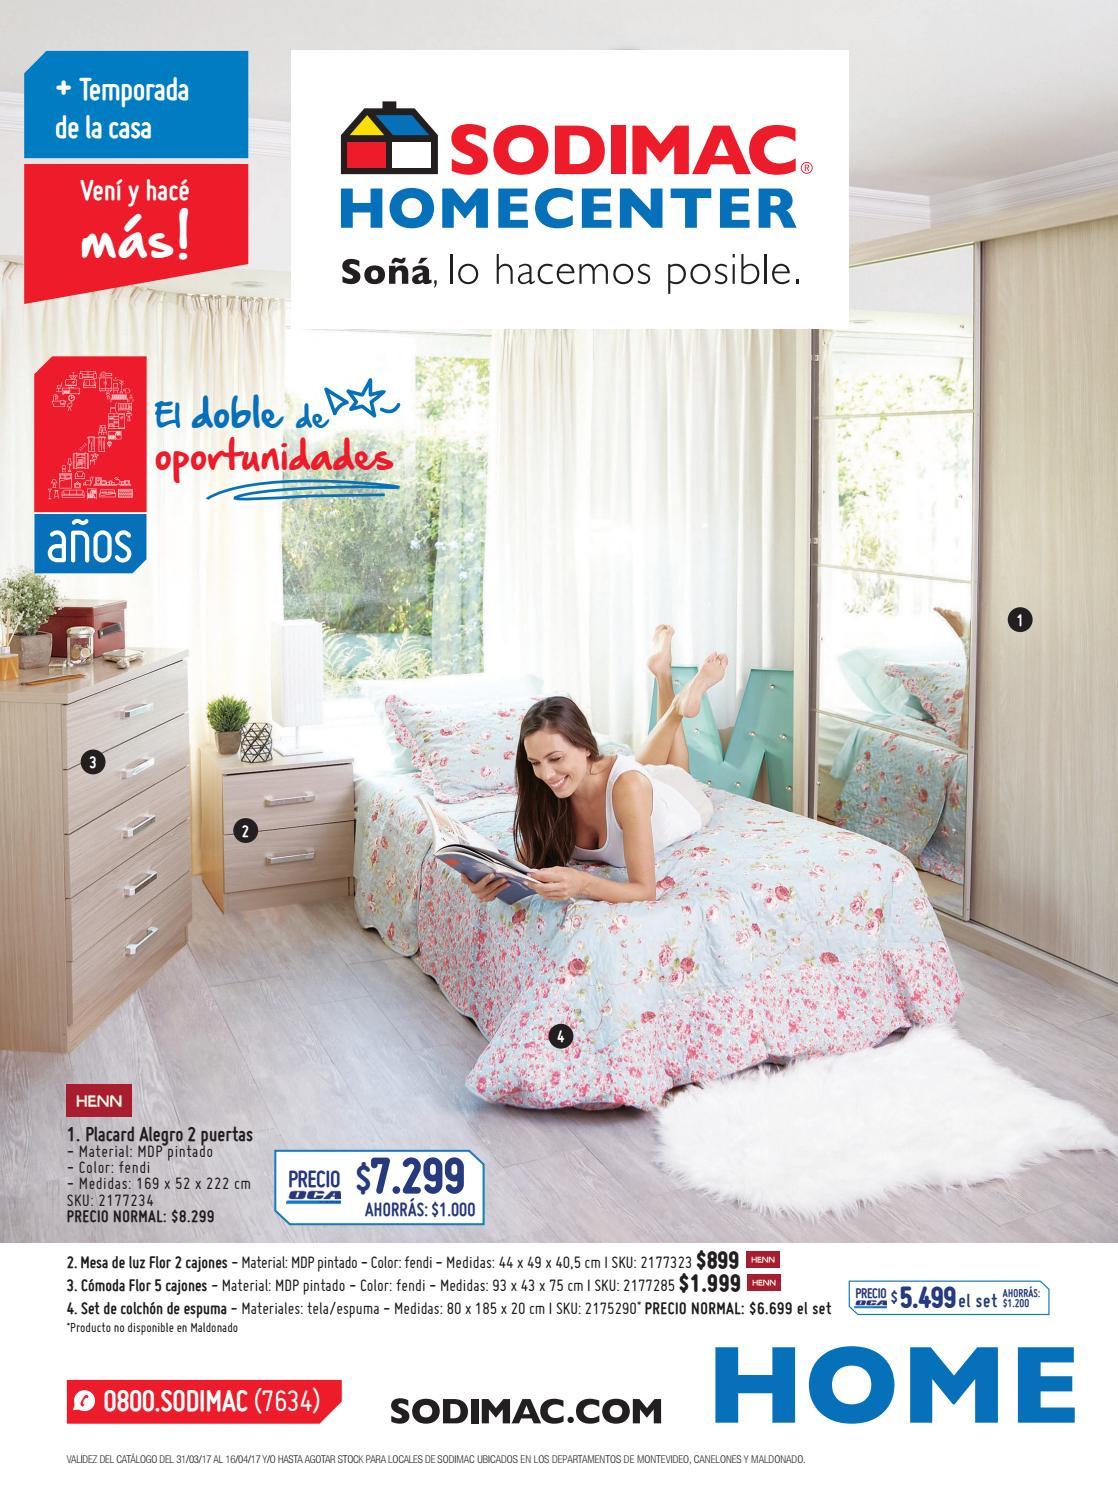 Cat Logo Sodimac Homecenter Abril 2017 By Sodimac Issuu # Muebles Xp Instalaciones